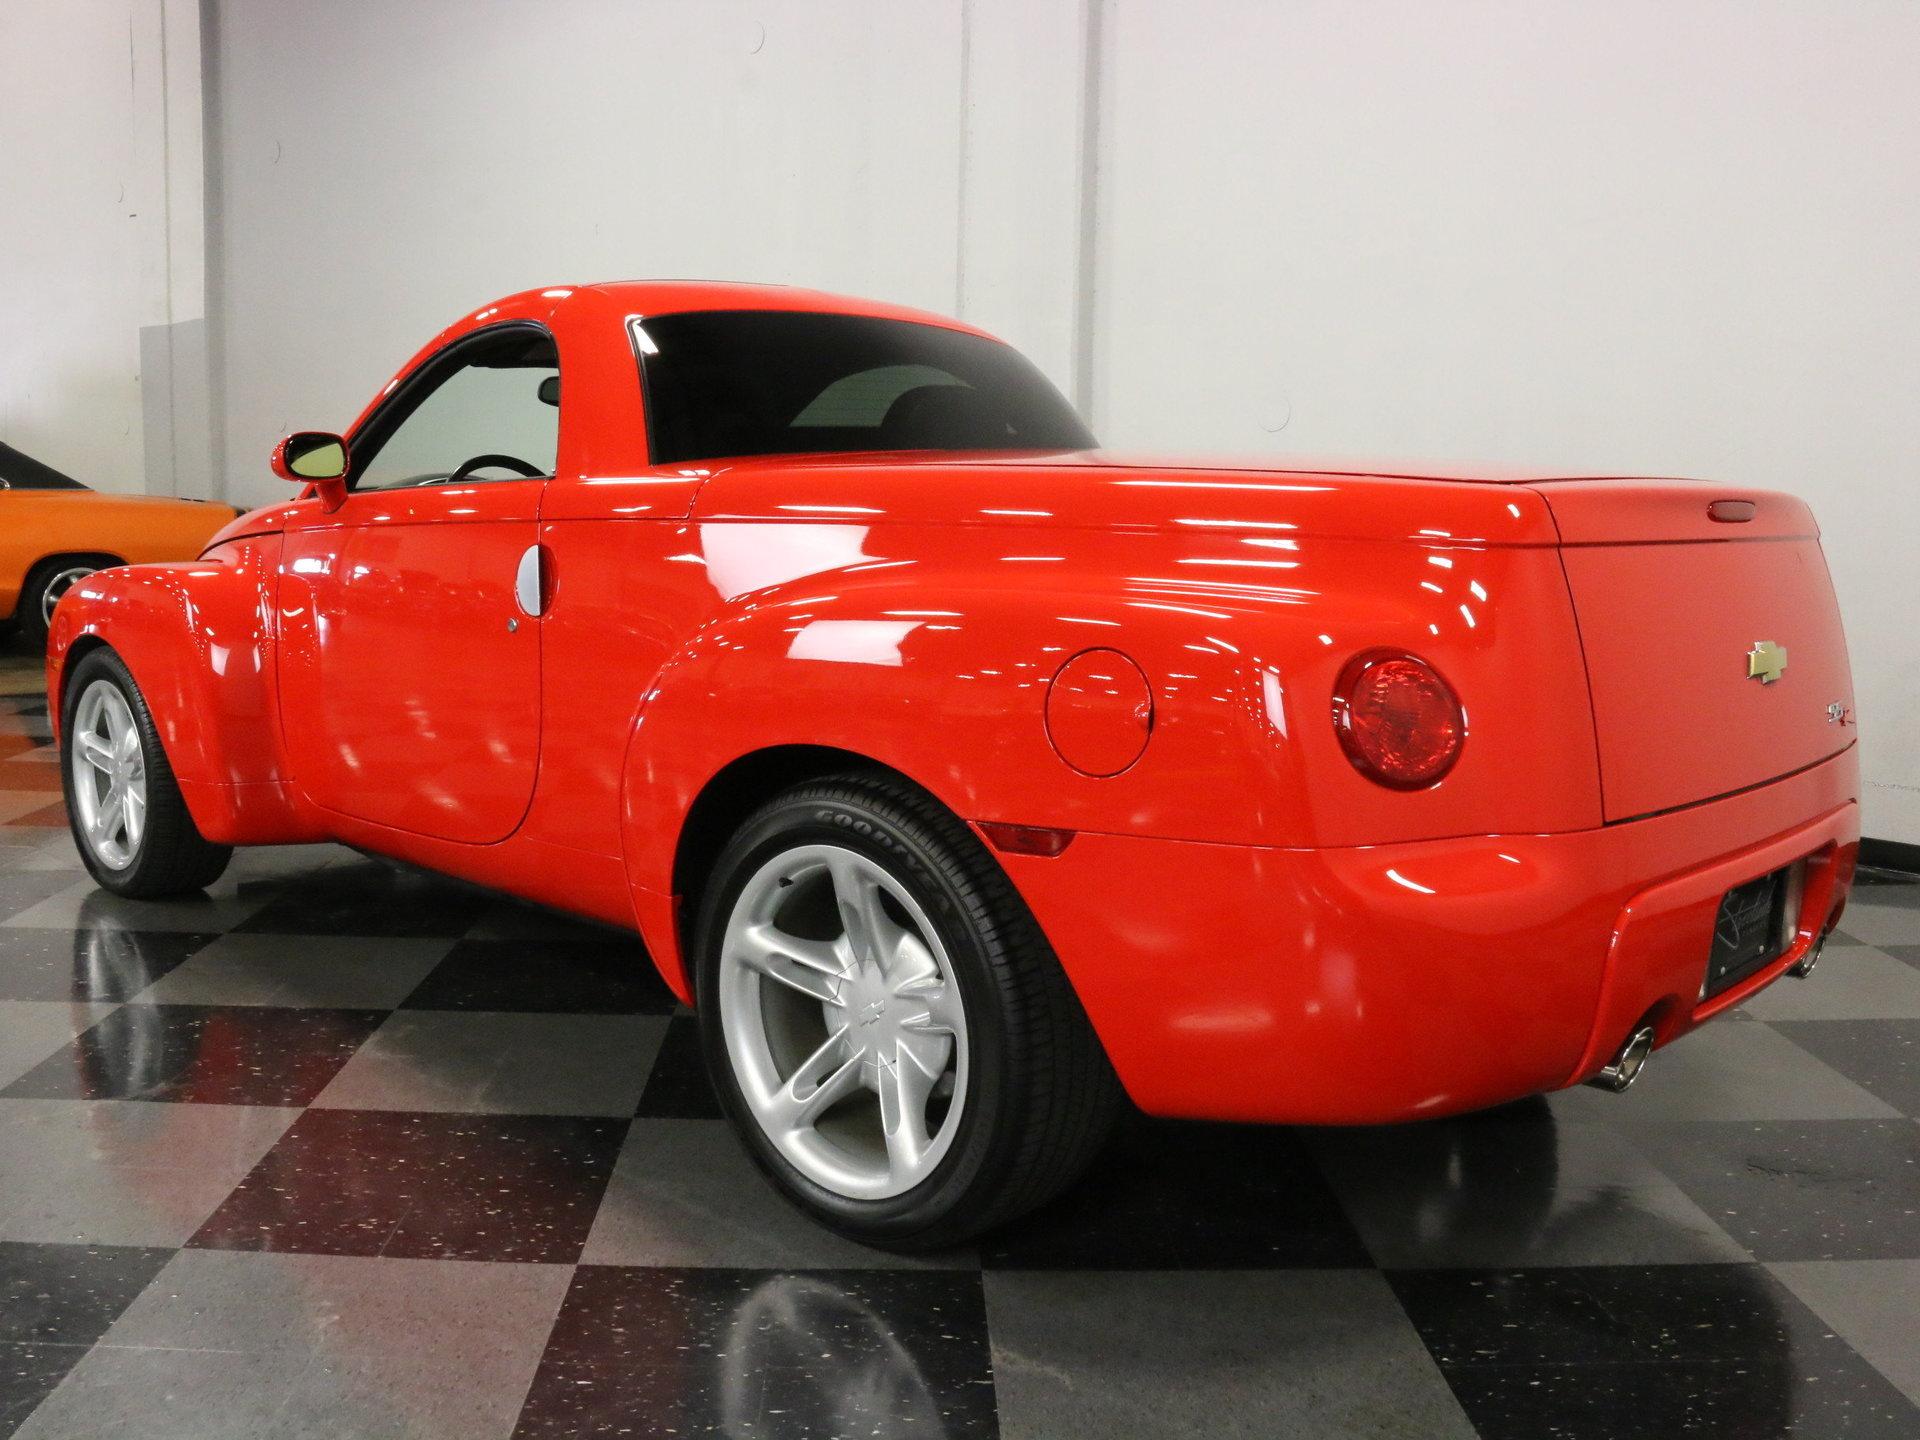 2004 Chevrolet Ssr For Sale 76015 Mcg